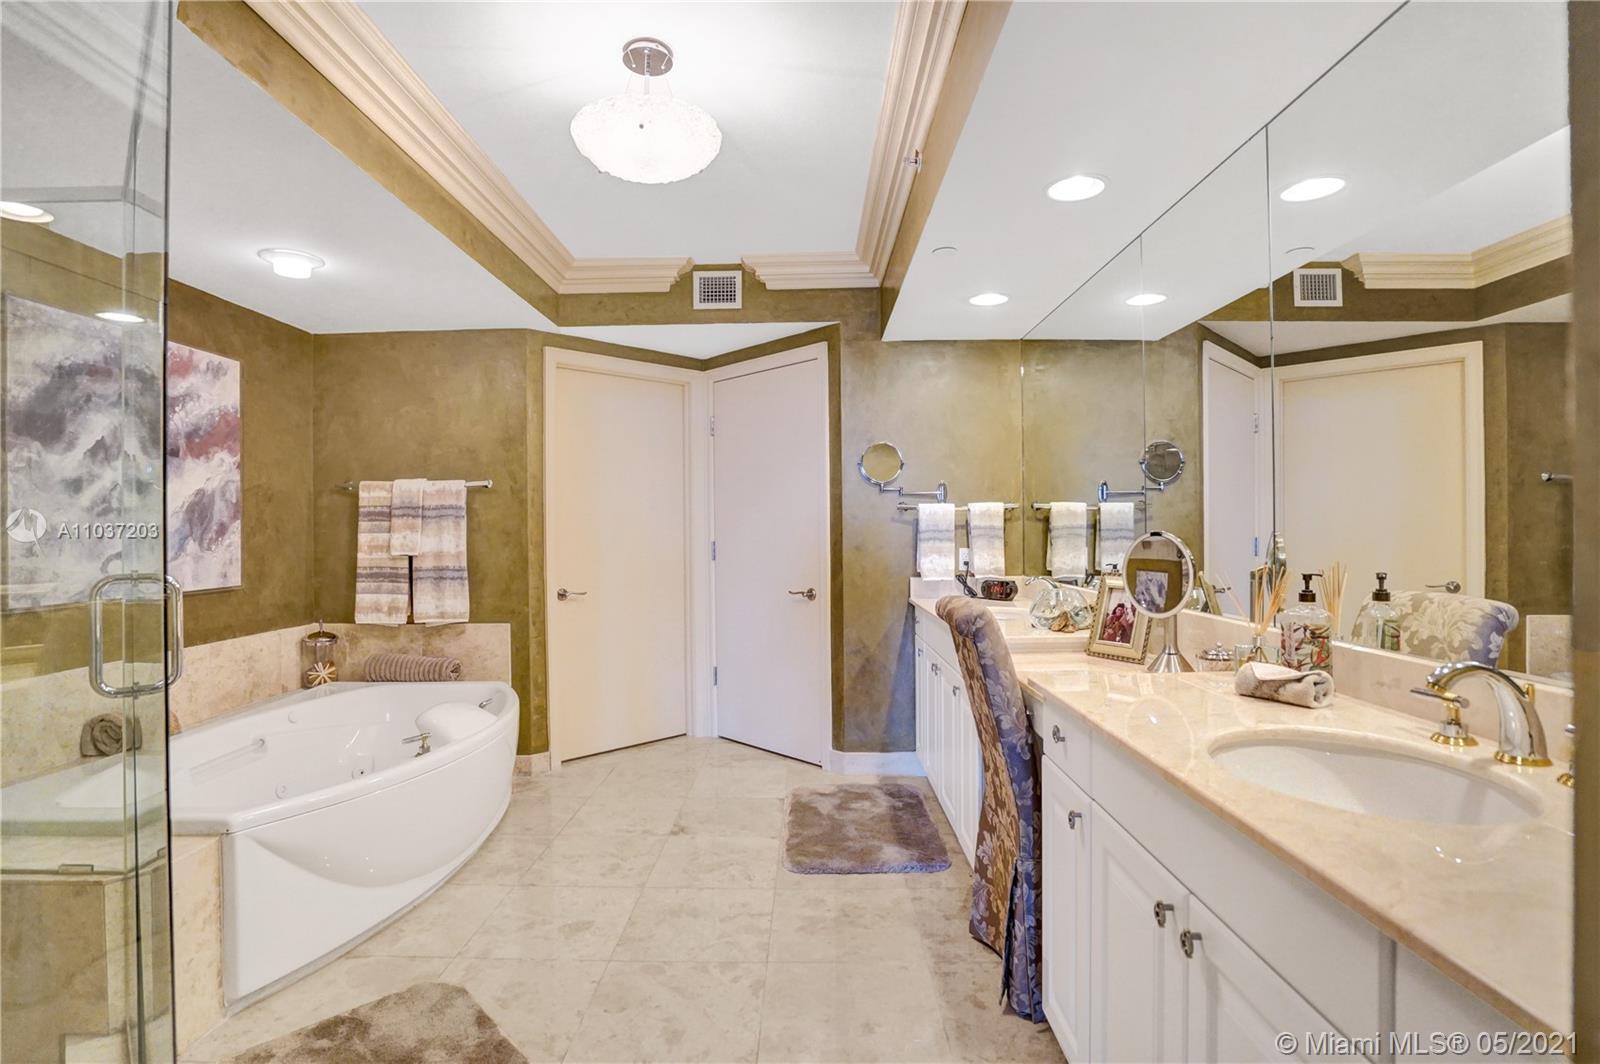 Photo of 20201 Country Club Dr #1006, Aventura, Florida, 33180 - His bathroom.